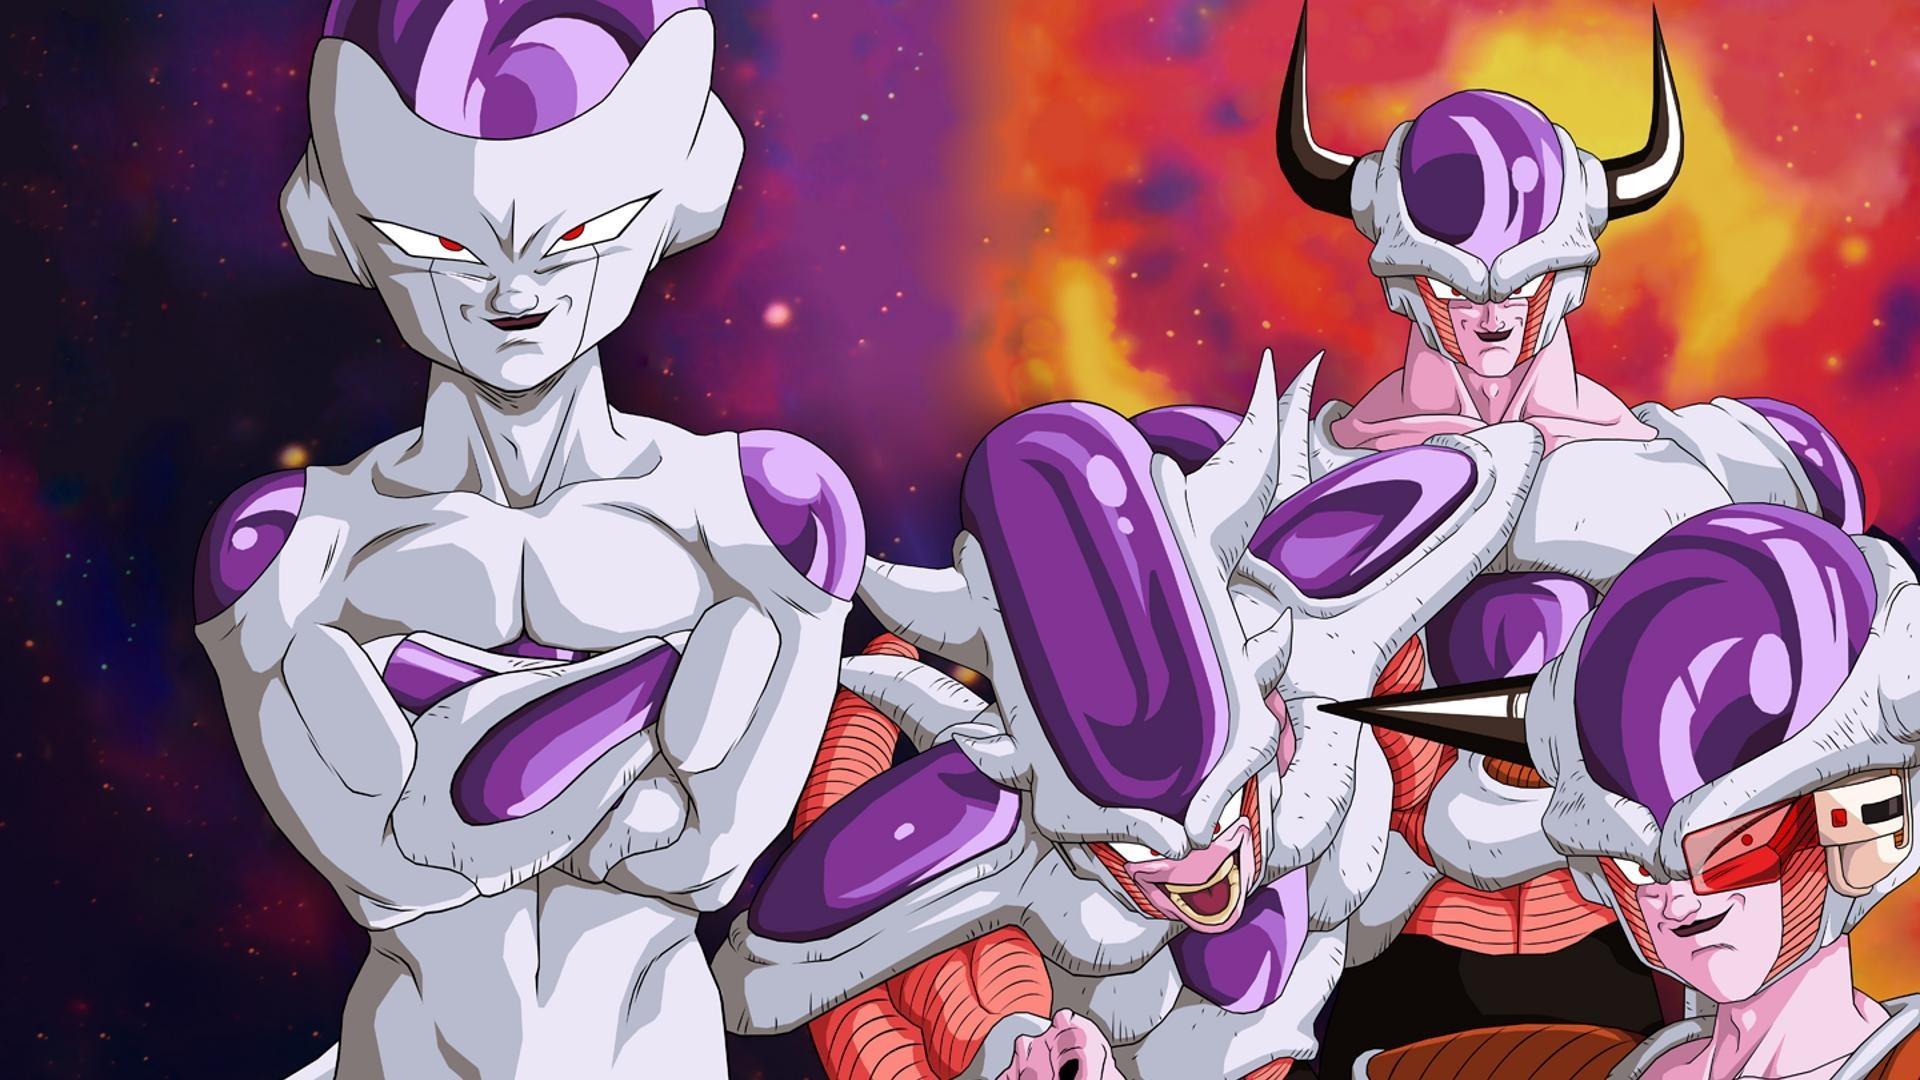 Anime – Dragon Ball Z Freeza (Dragon Ball) Wallpaper